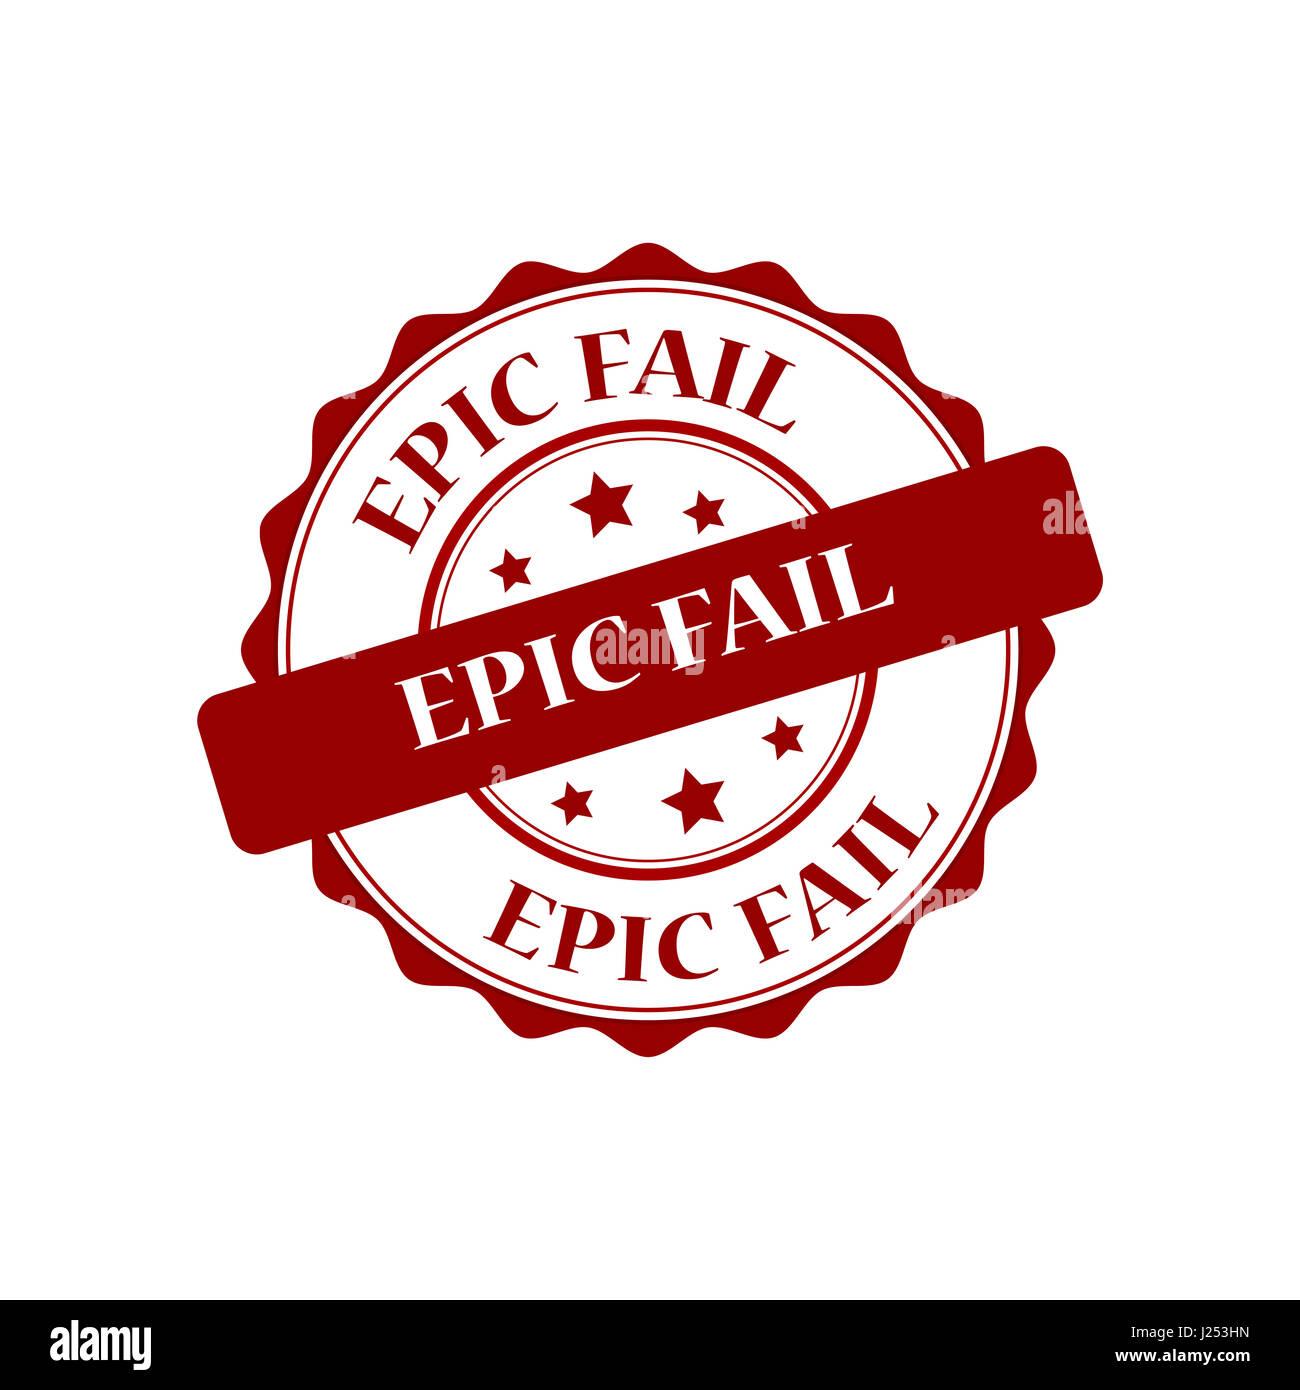 Epic fail stamp illustration - Stock Image